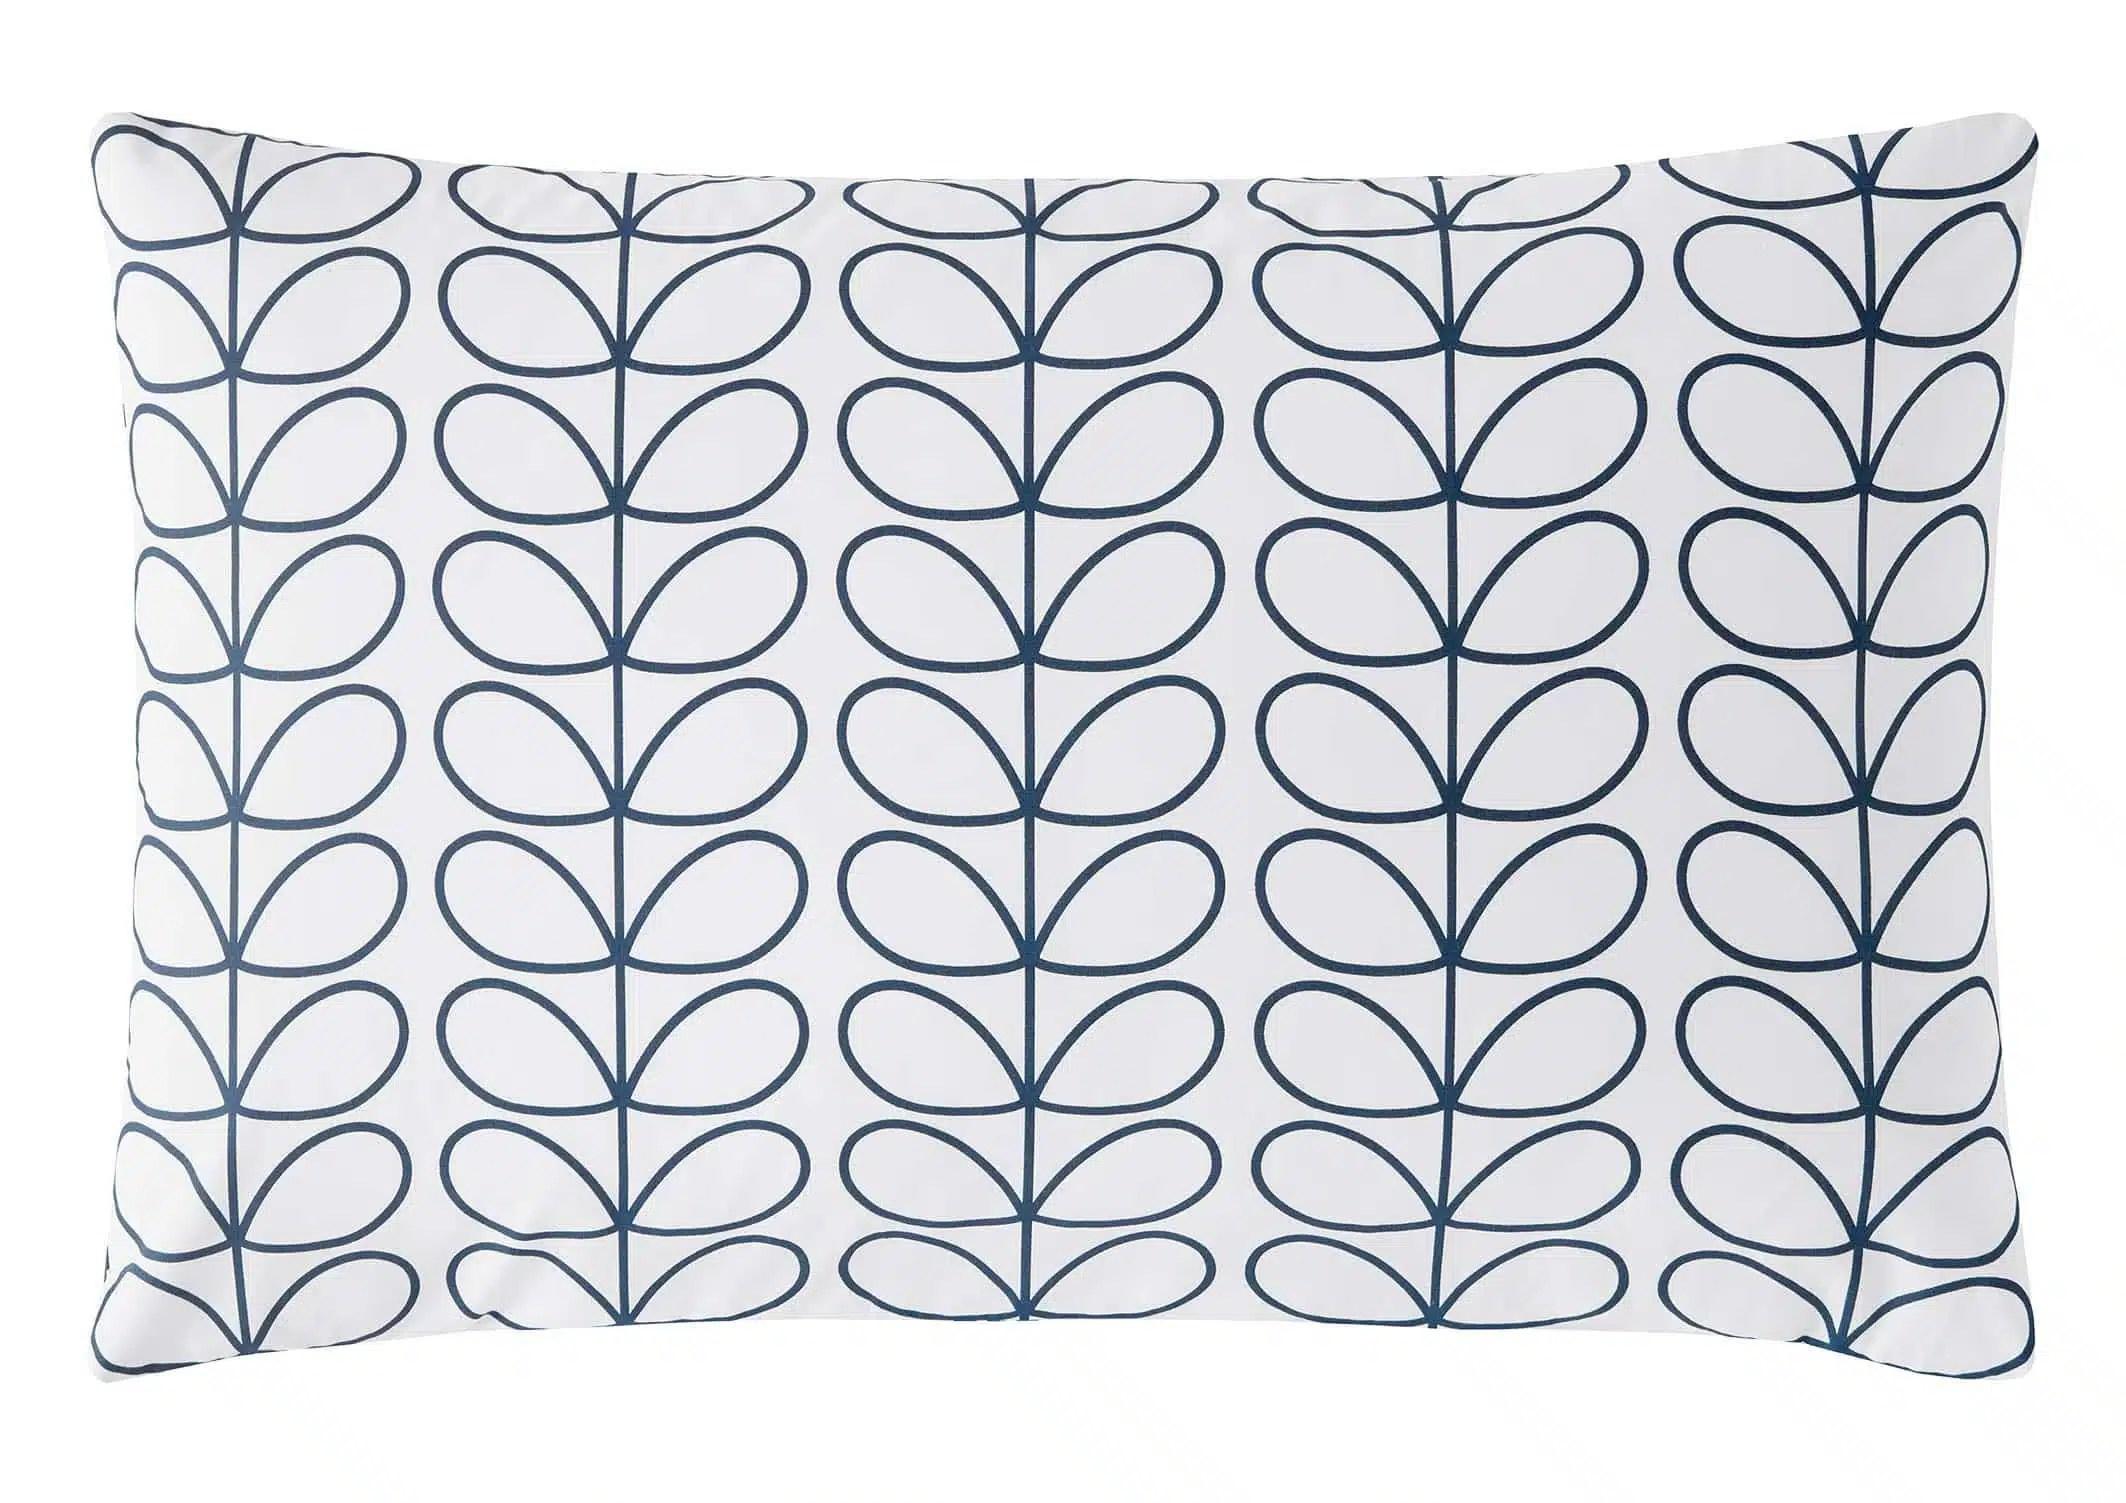 Orla Kiely Tiny Stem Retro Leaf Designer Bedding in Whale Navy Blue 100/% Cotton